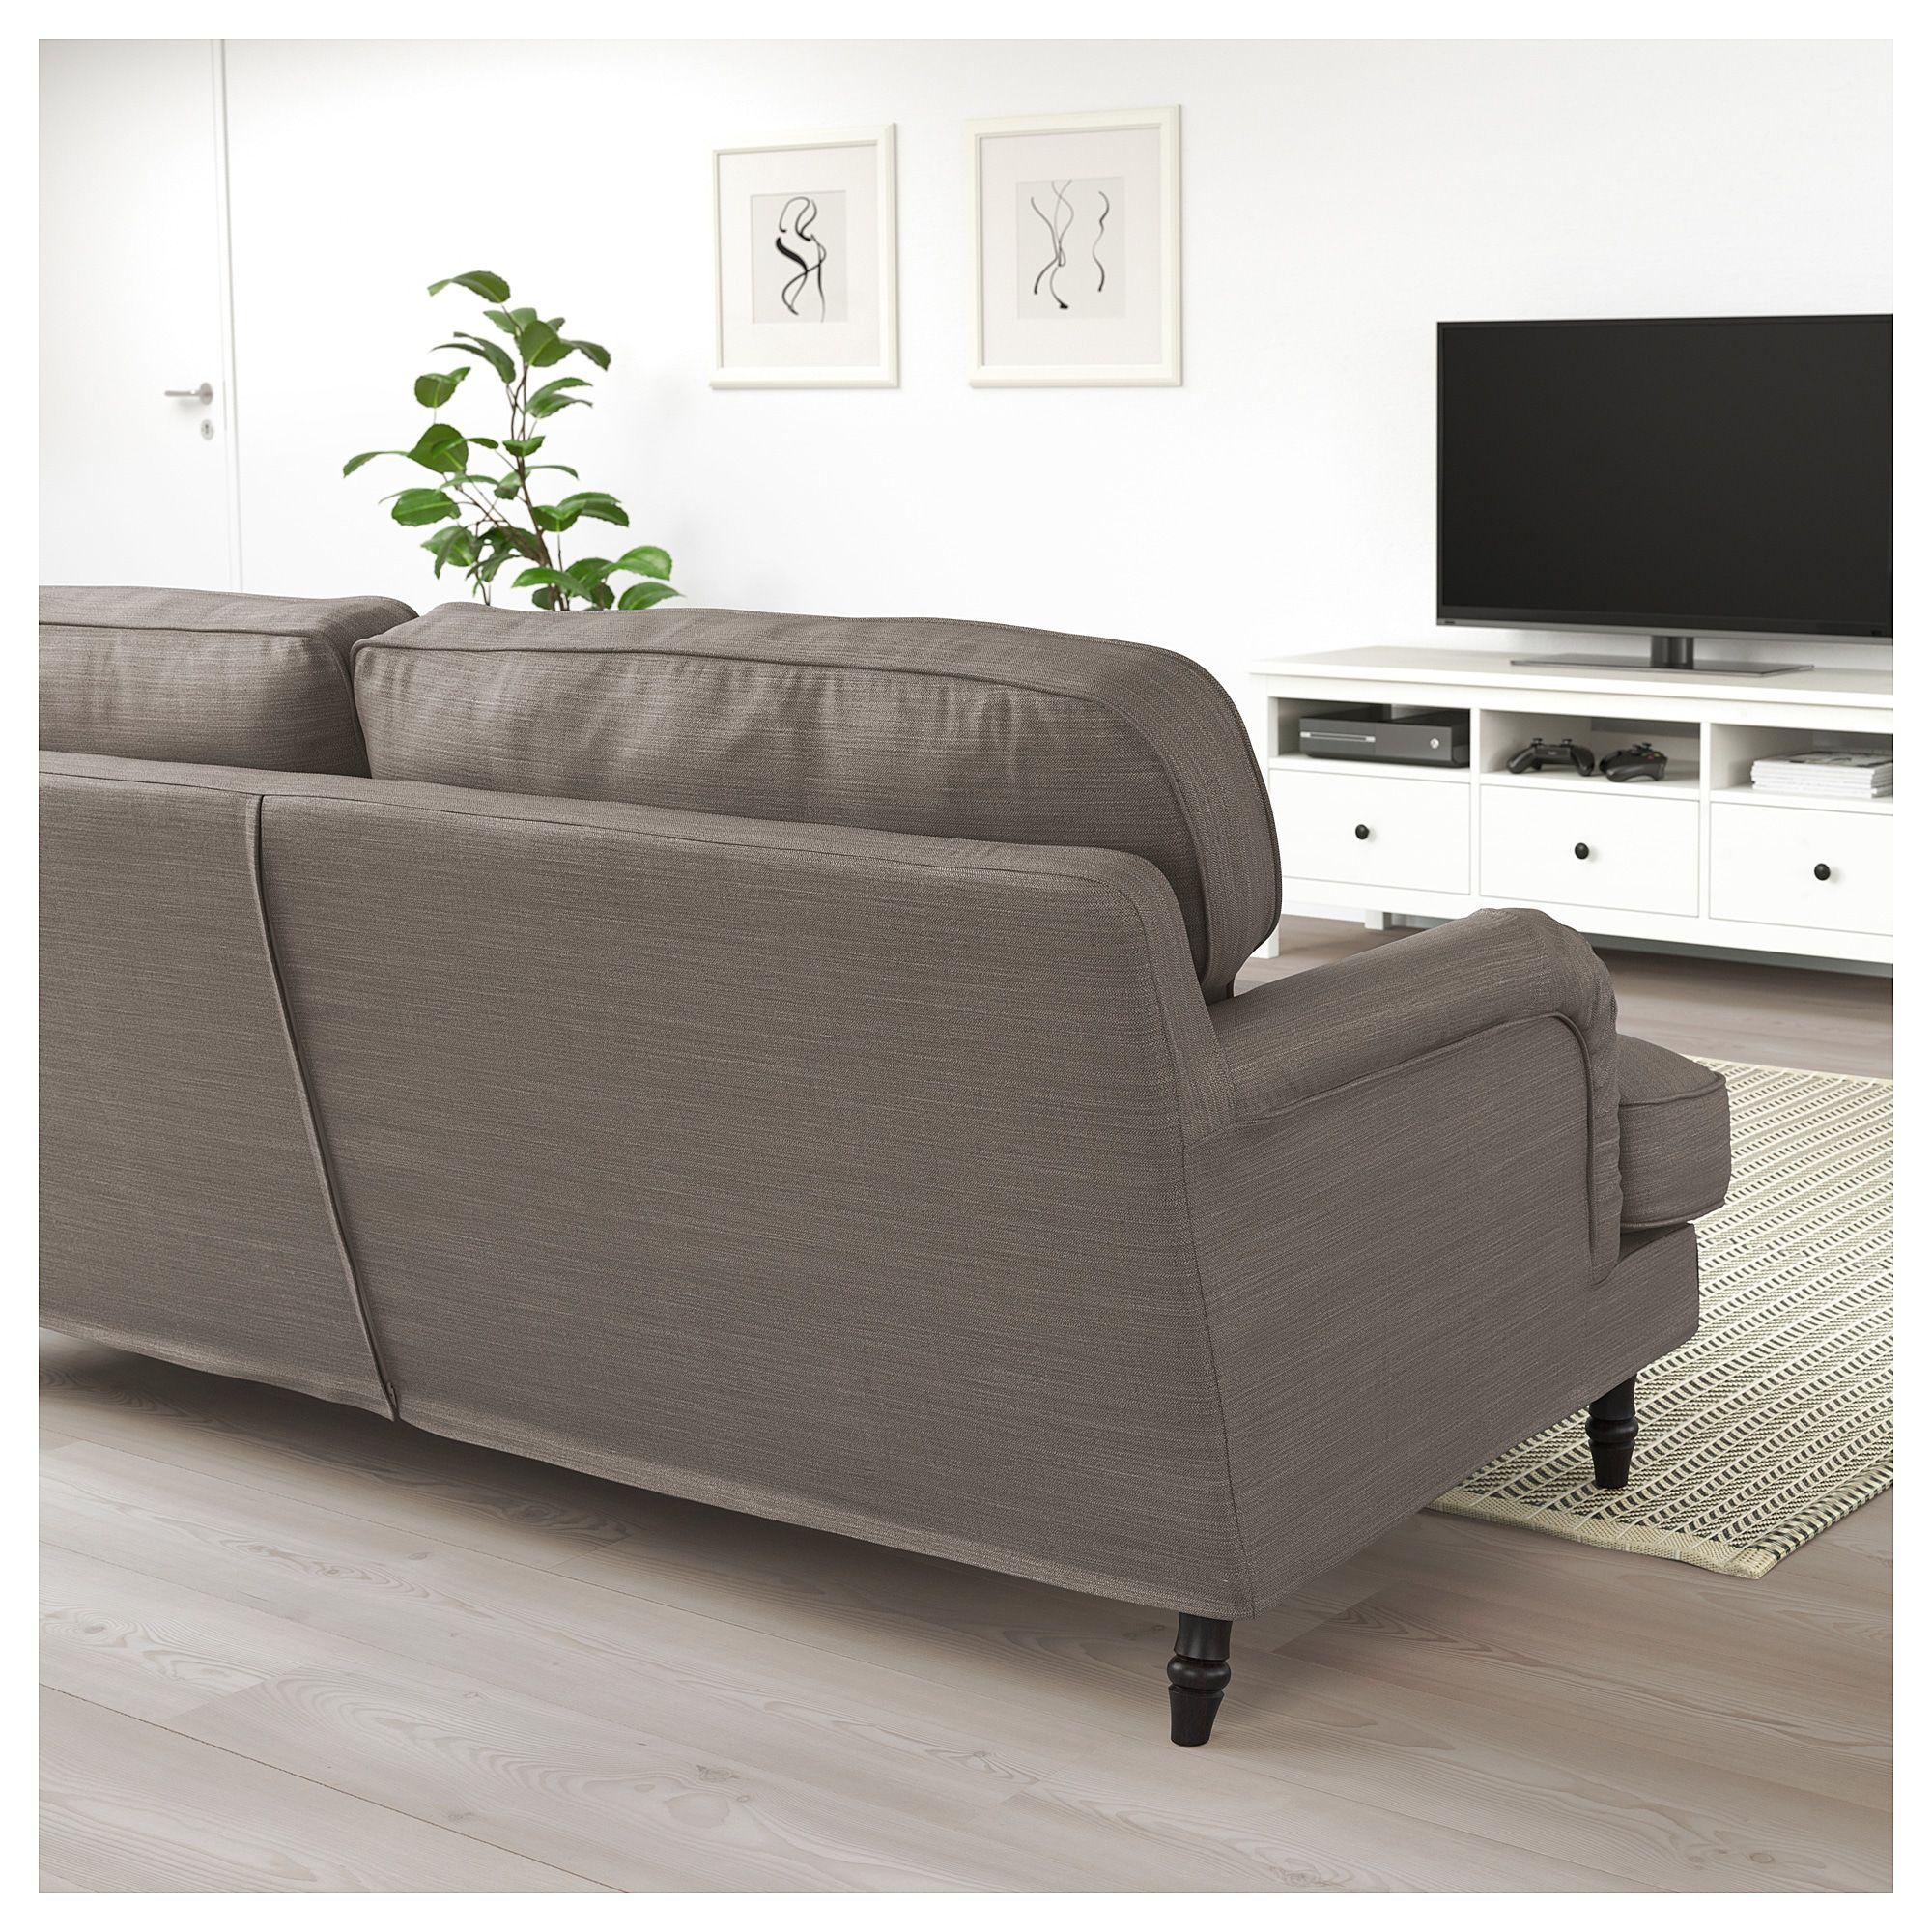 Stocksund Sofa Nolhaga Gray Beige Find It Here Ikea Stocksund